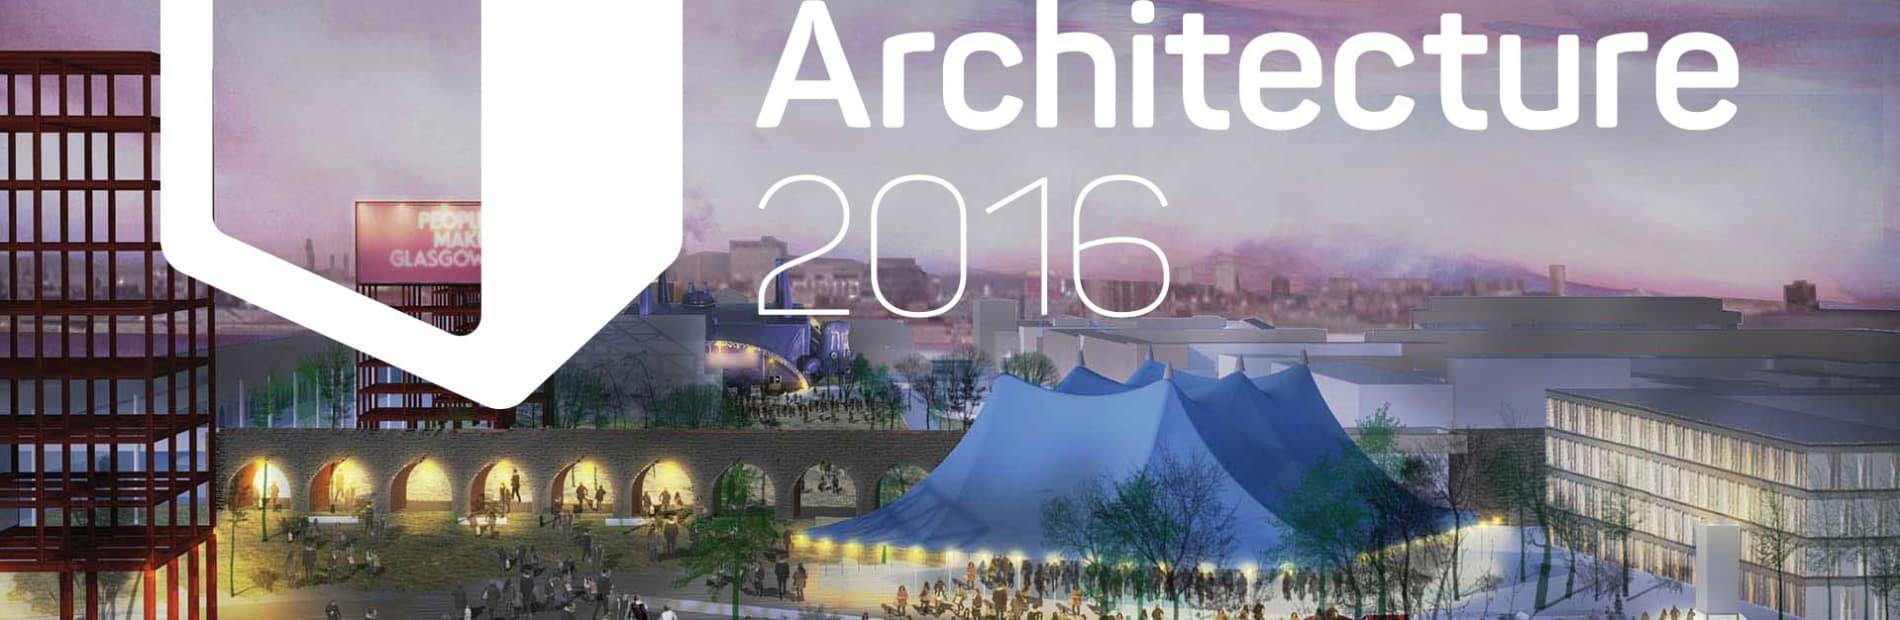 Edinburghs festival of architecture 2016